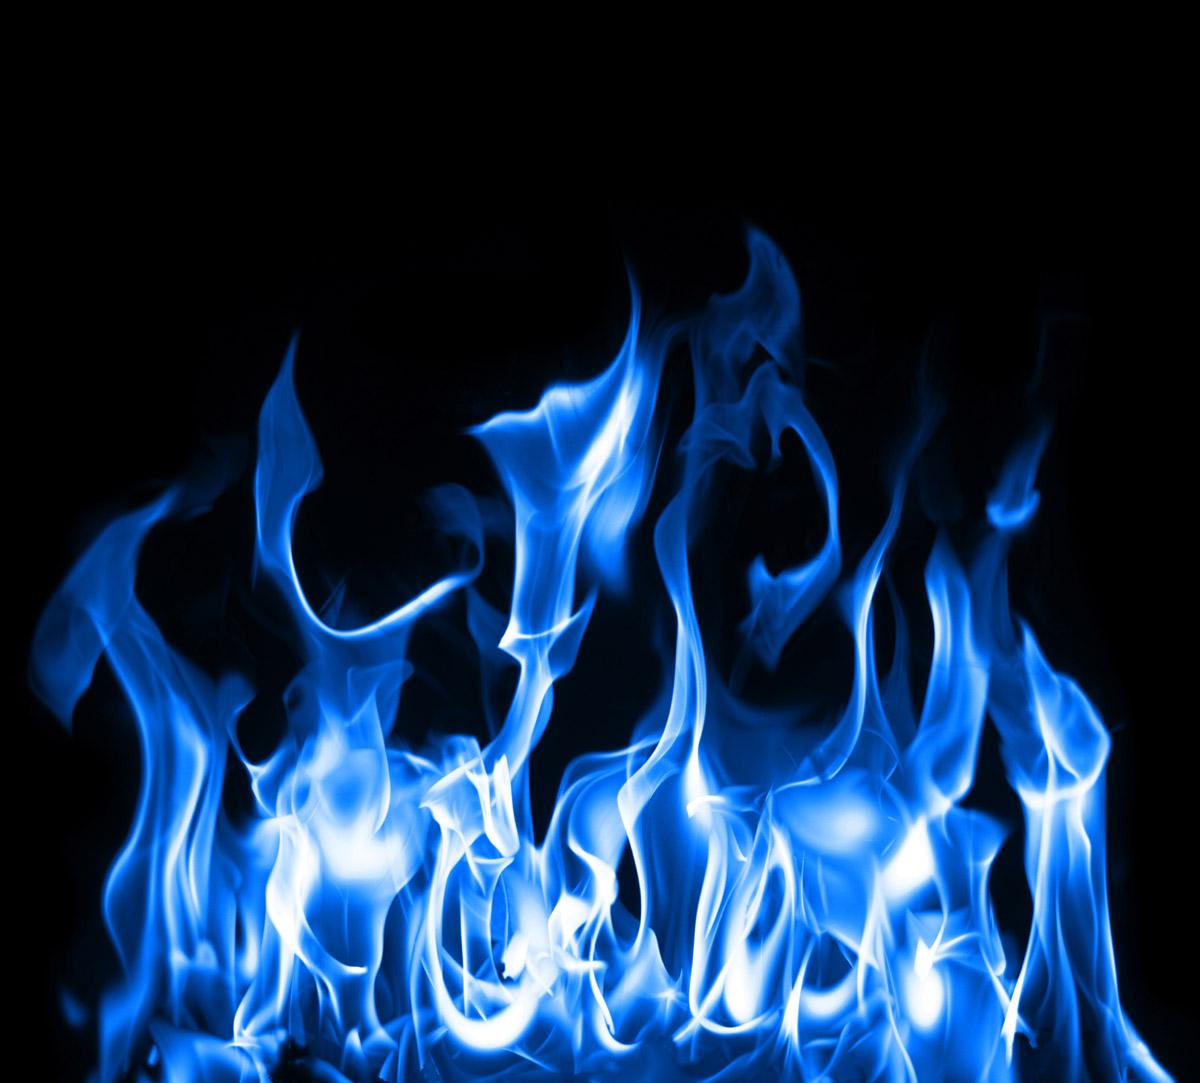 blue flame wallpaperjpg 1200x1083